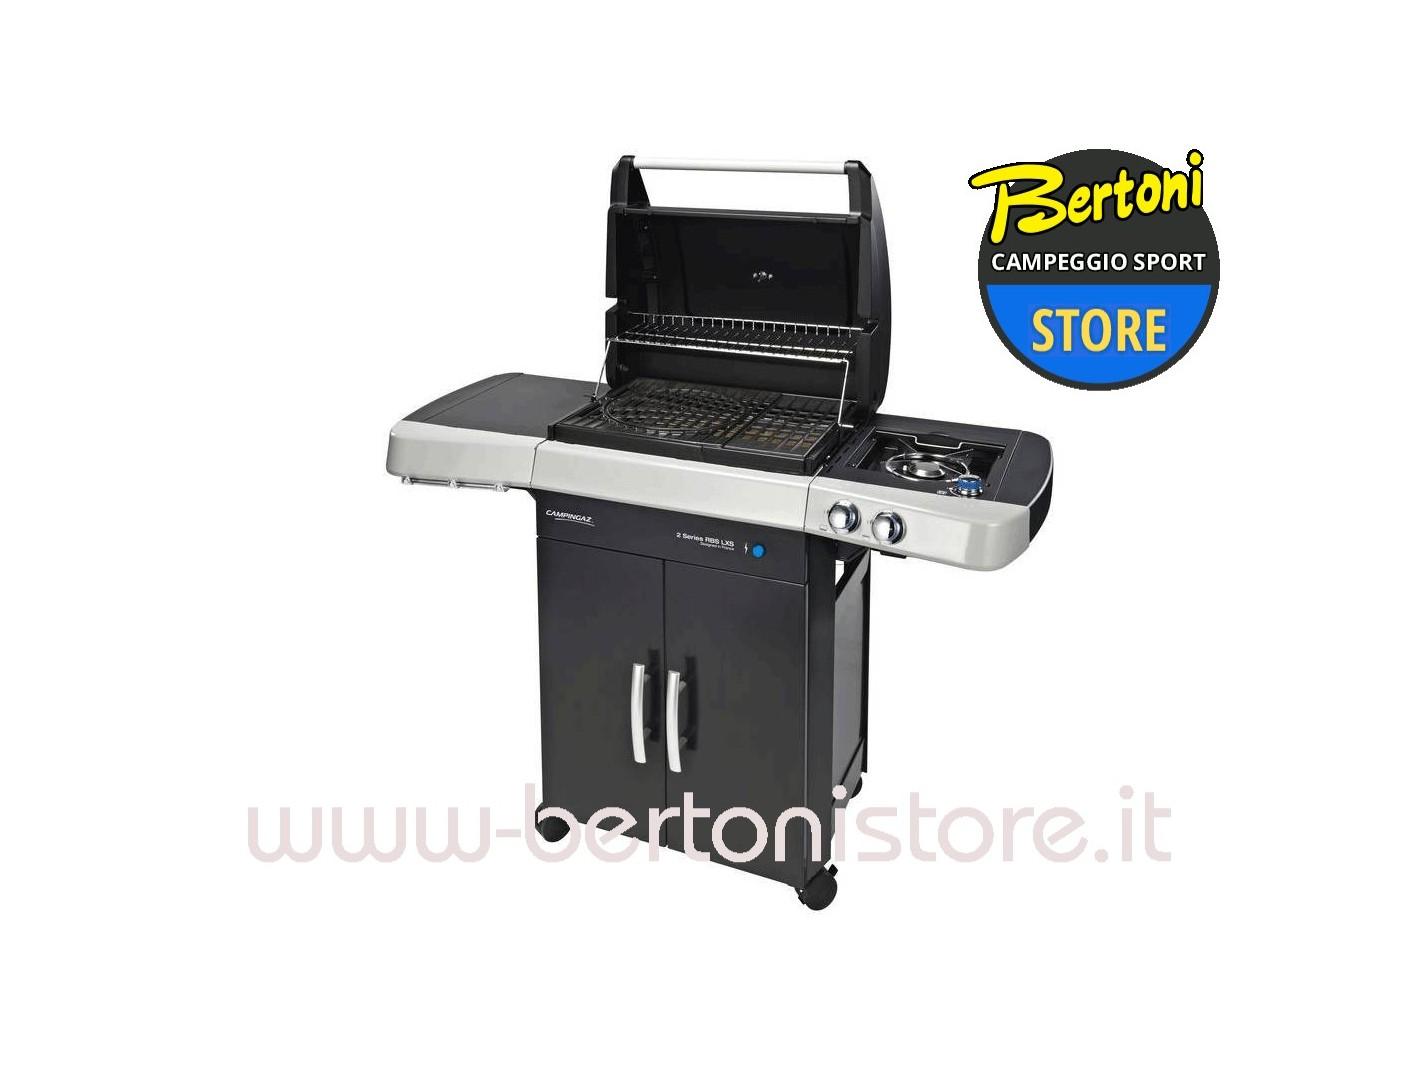 barbecue a gas 2 series rbs lxs 2000025147 campingaz bertoni store milano. Black Bedroom Furniture Sets. Home Design Ideas